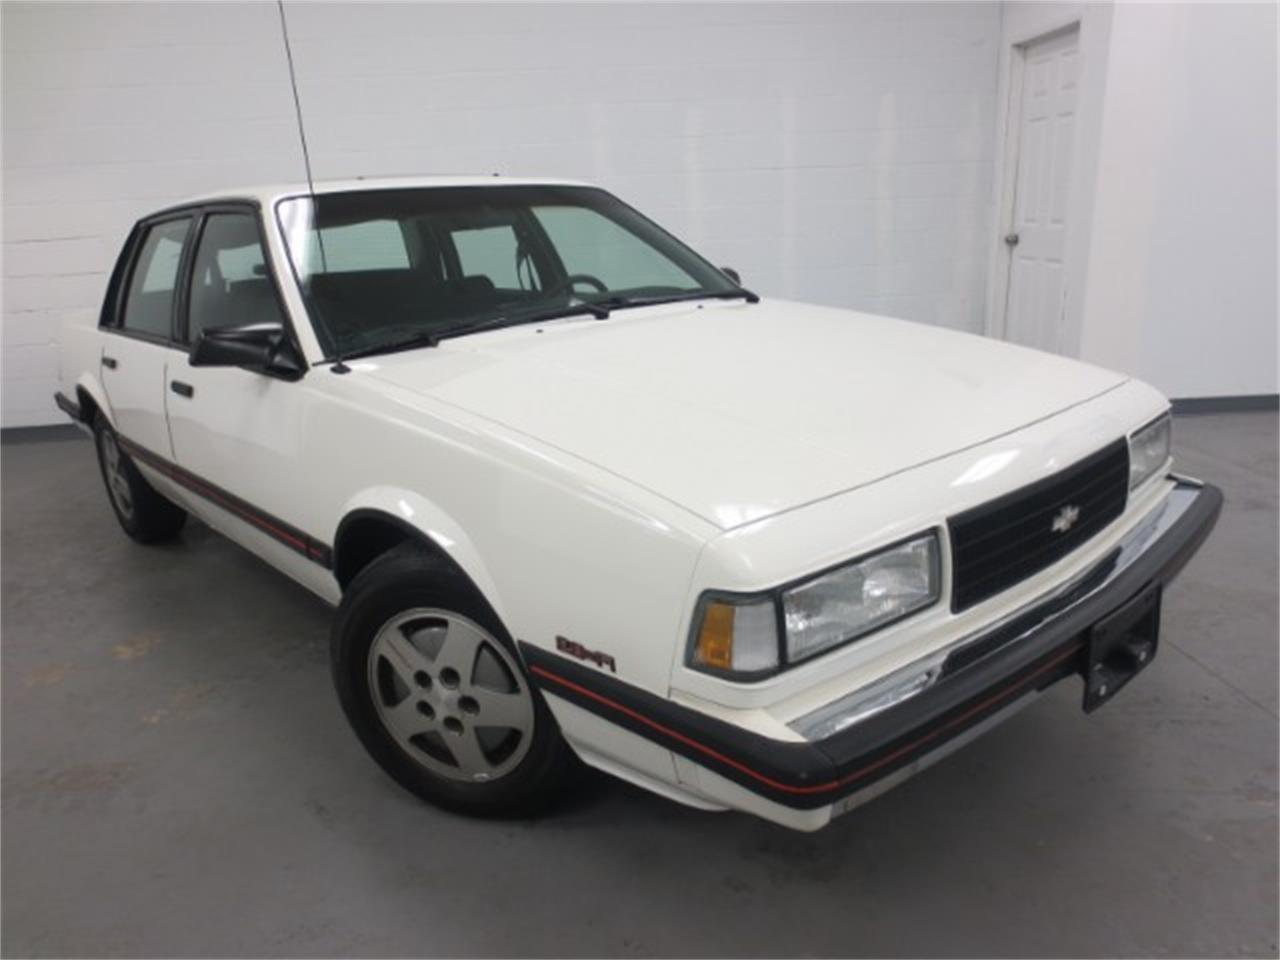 Black Chevy Celebrity 1987 Fuse Box Chevrolet For Sale 1280x960